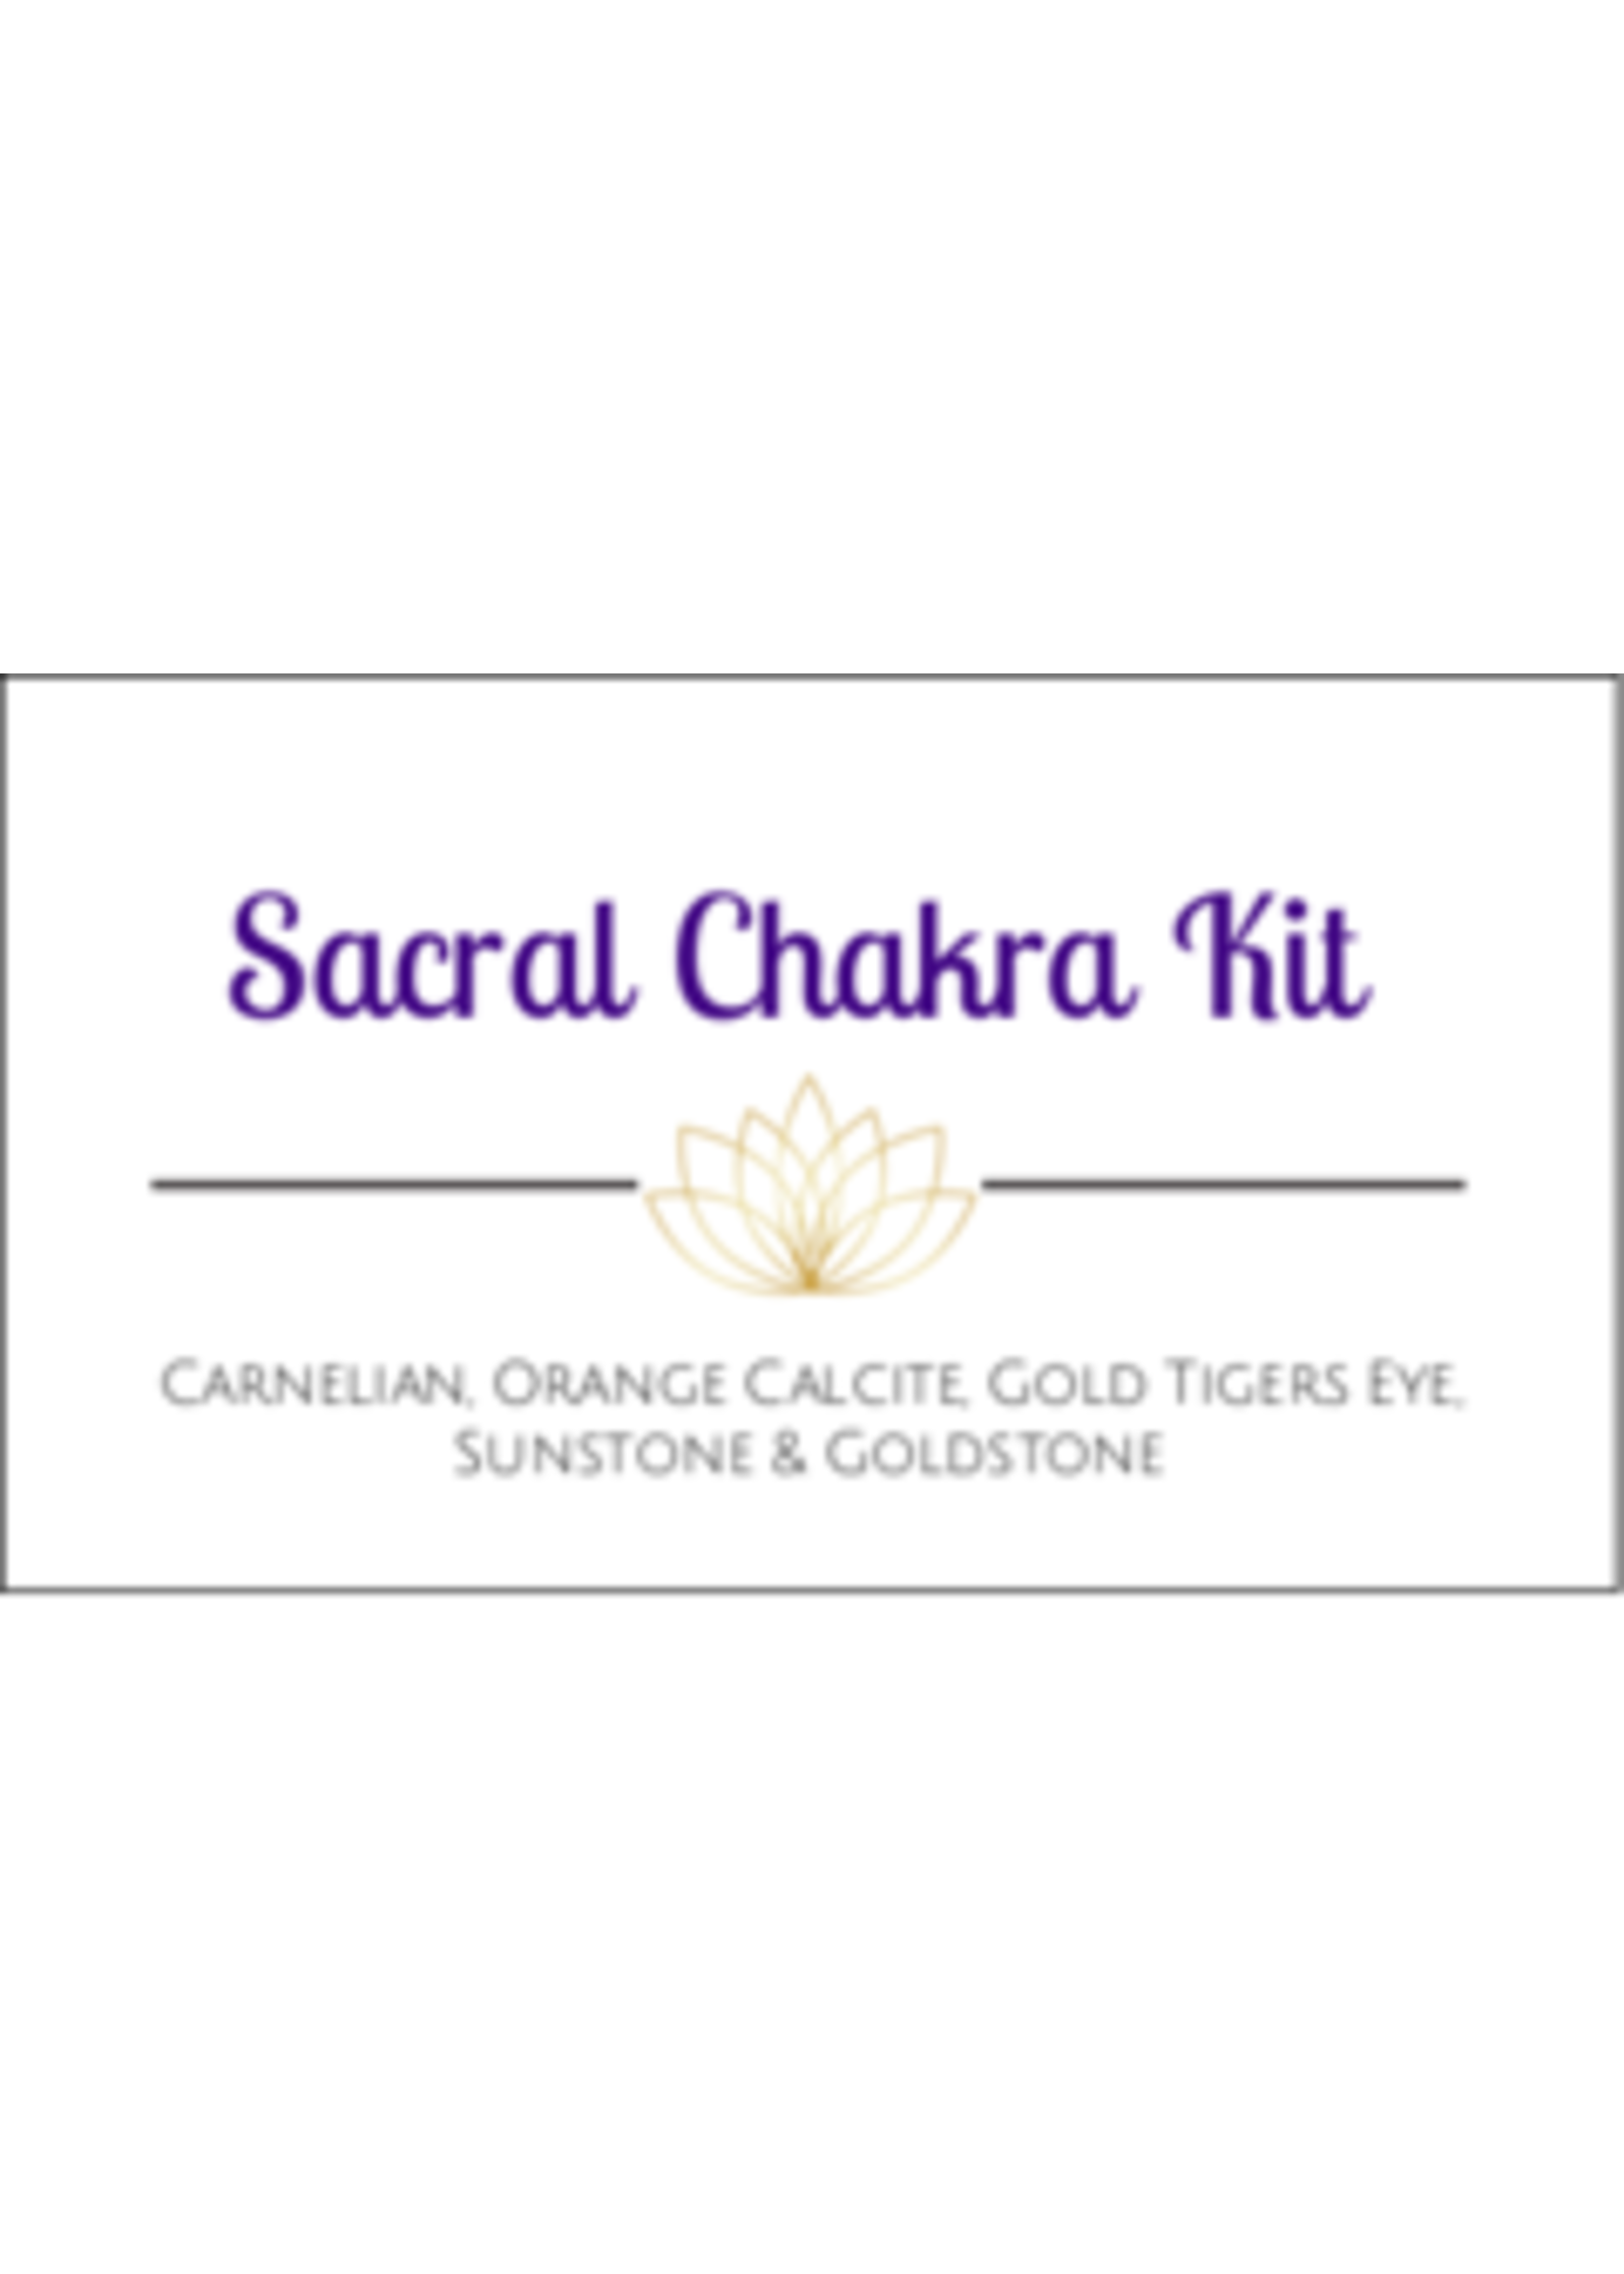 Sacral Chakra Crystal Kit Cards - Box of 100